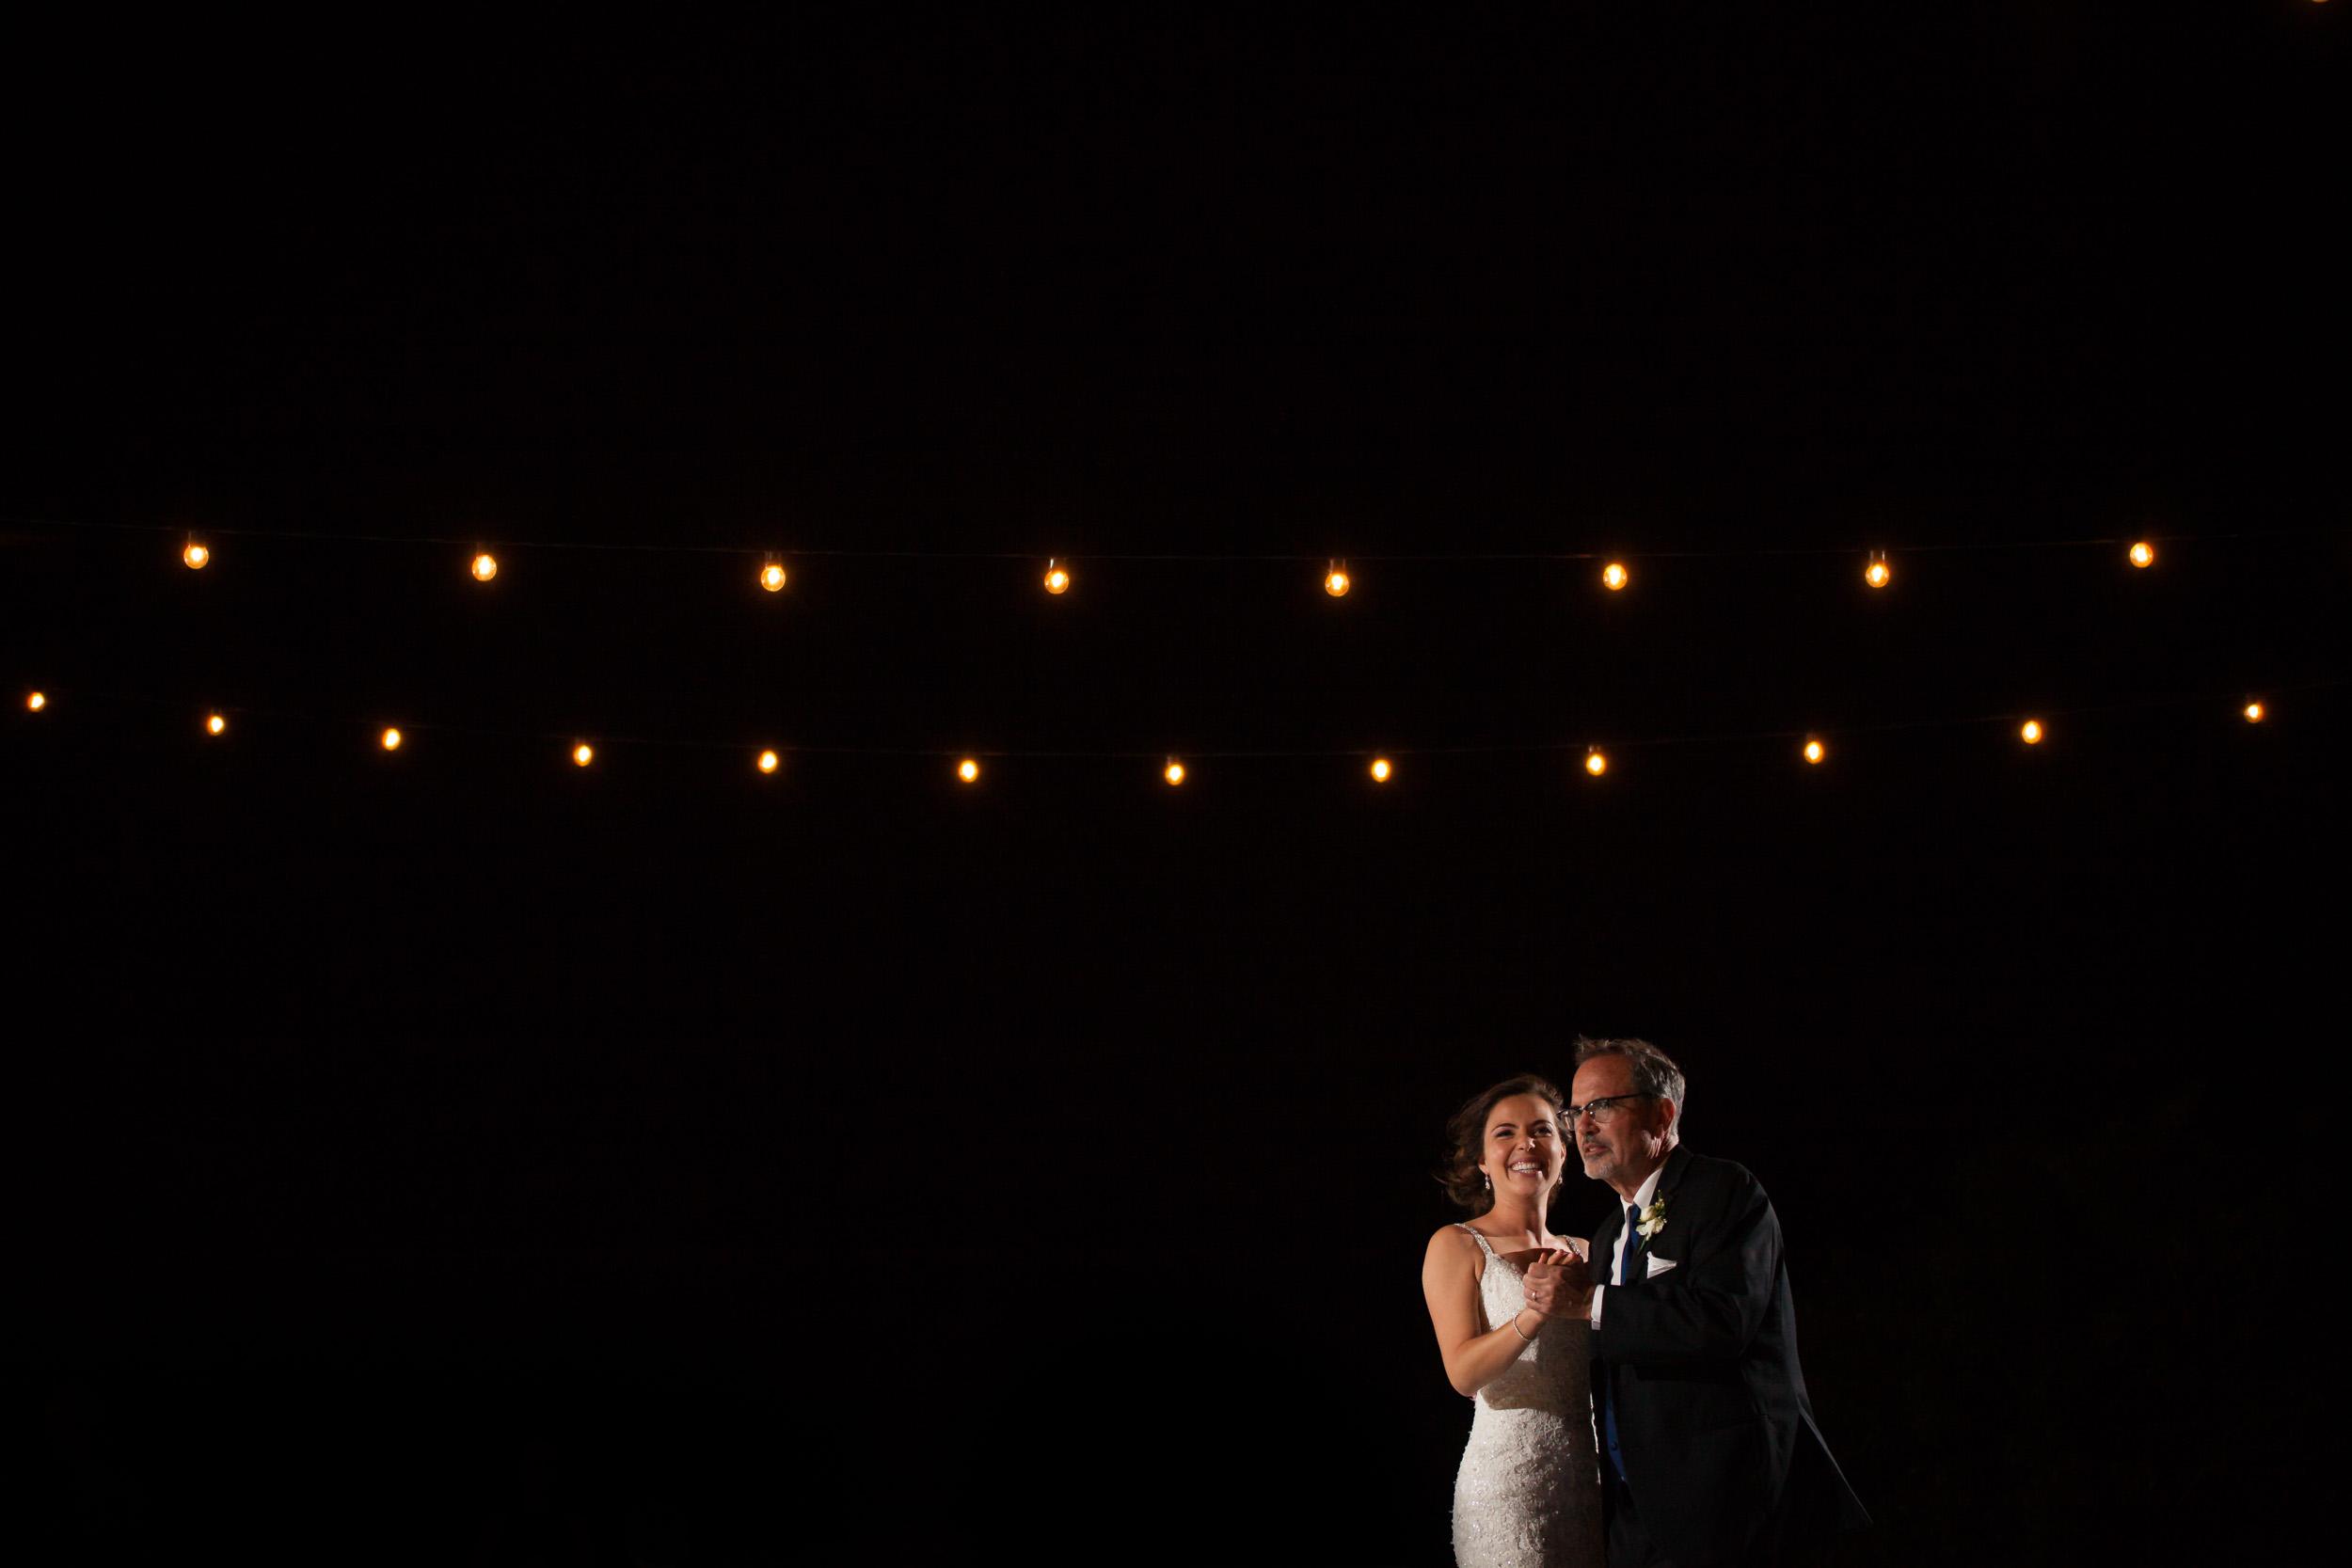 Flordia-Wedding-Photography-68.jpg